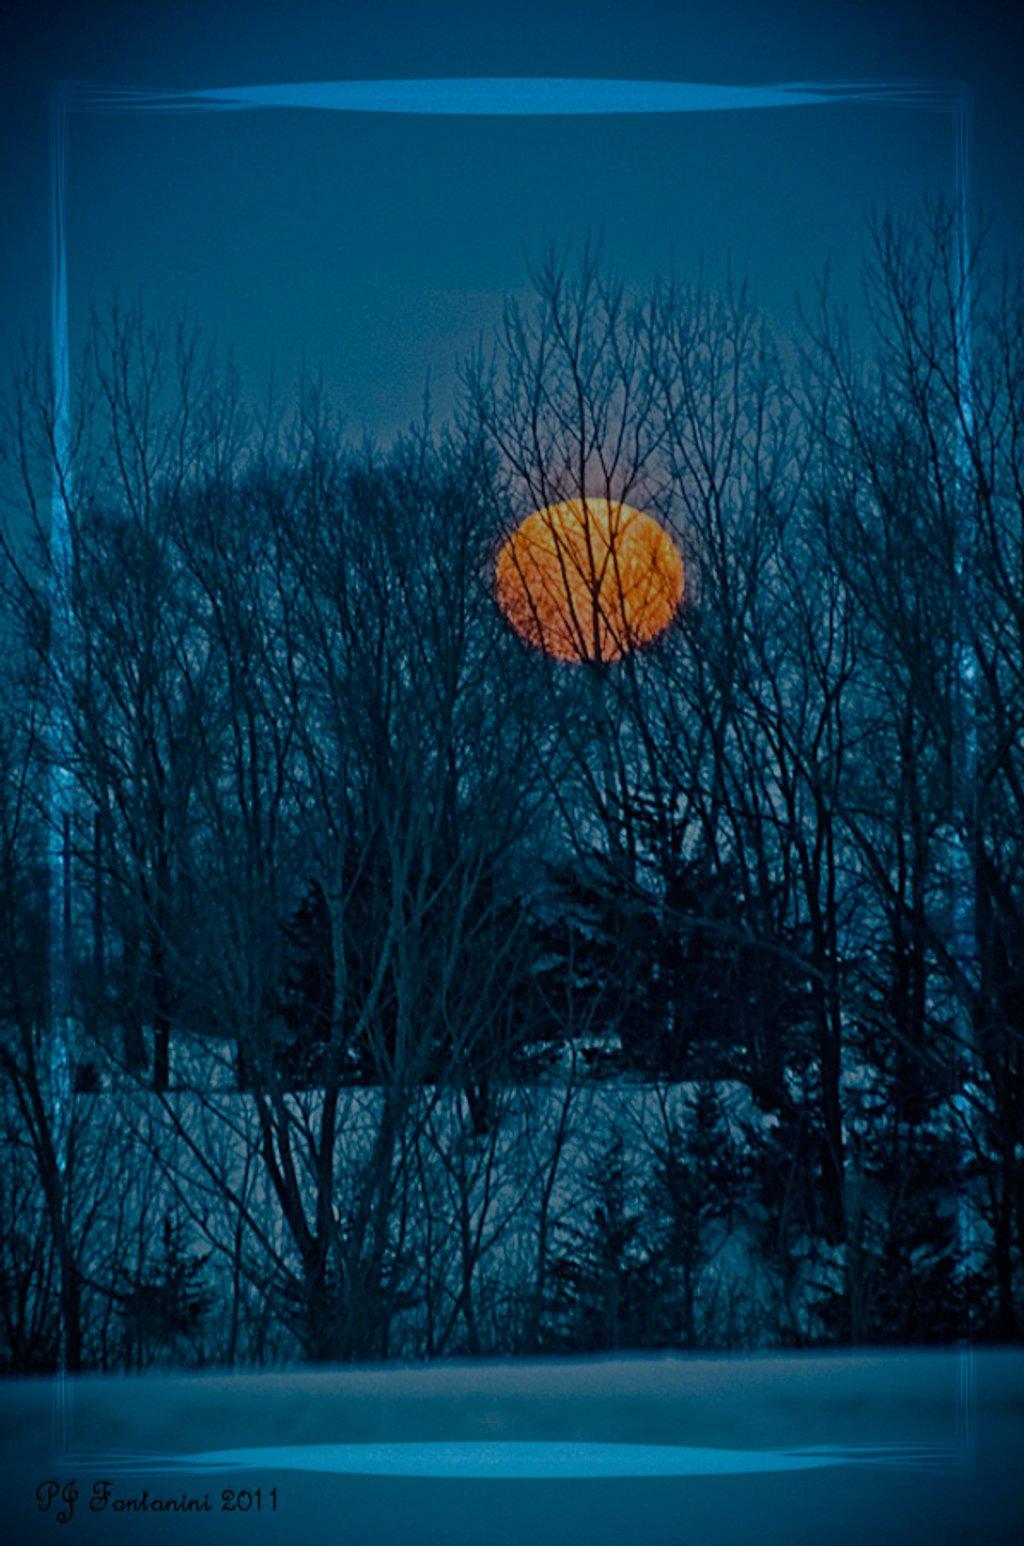 Orange Delight by bluemoon